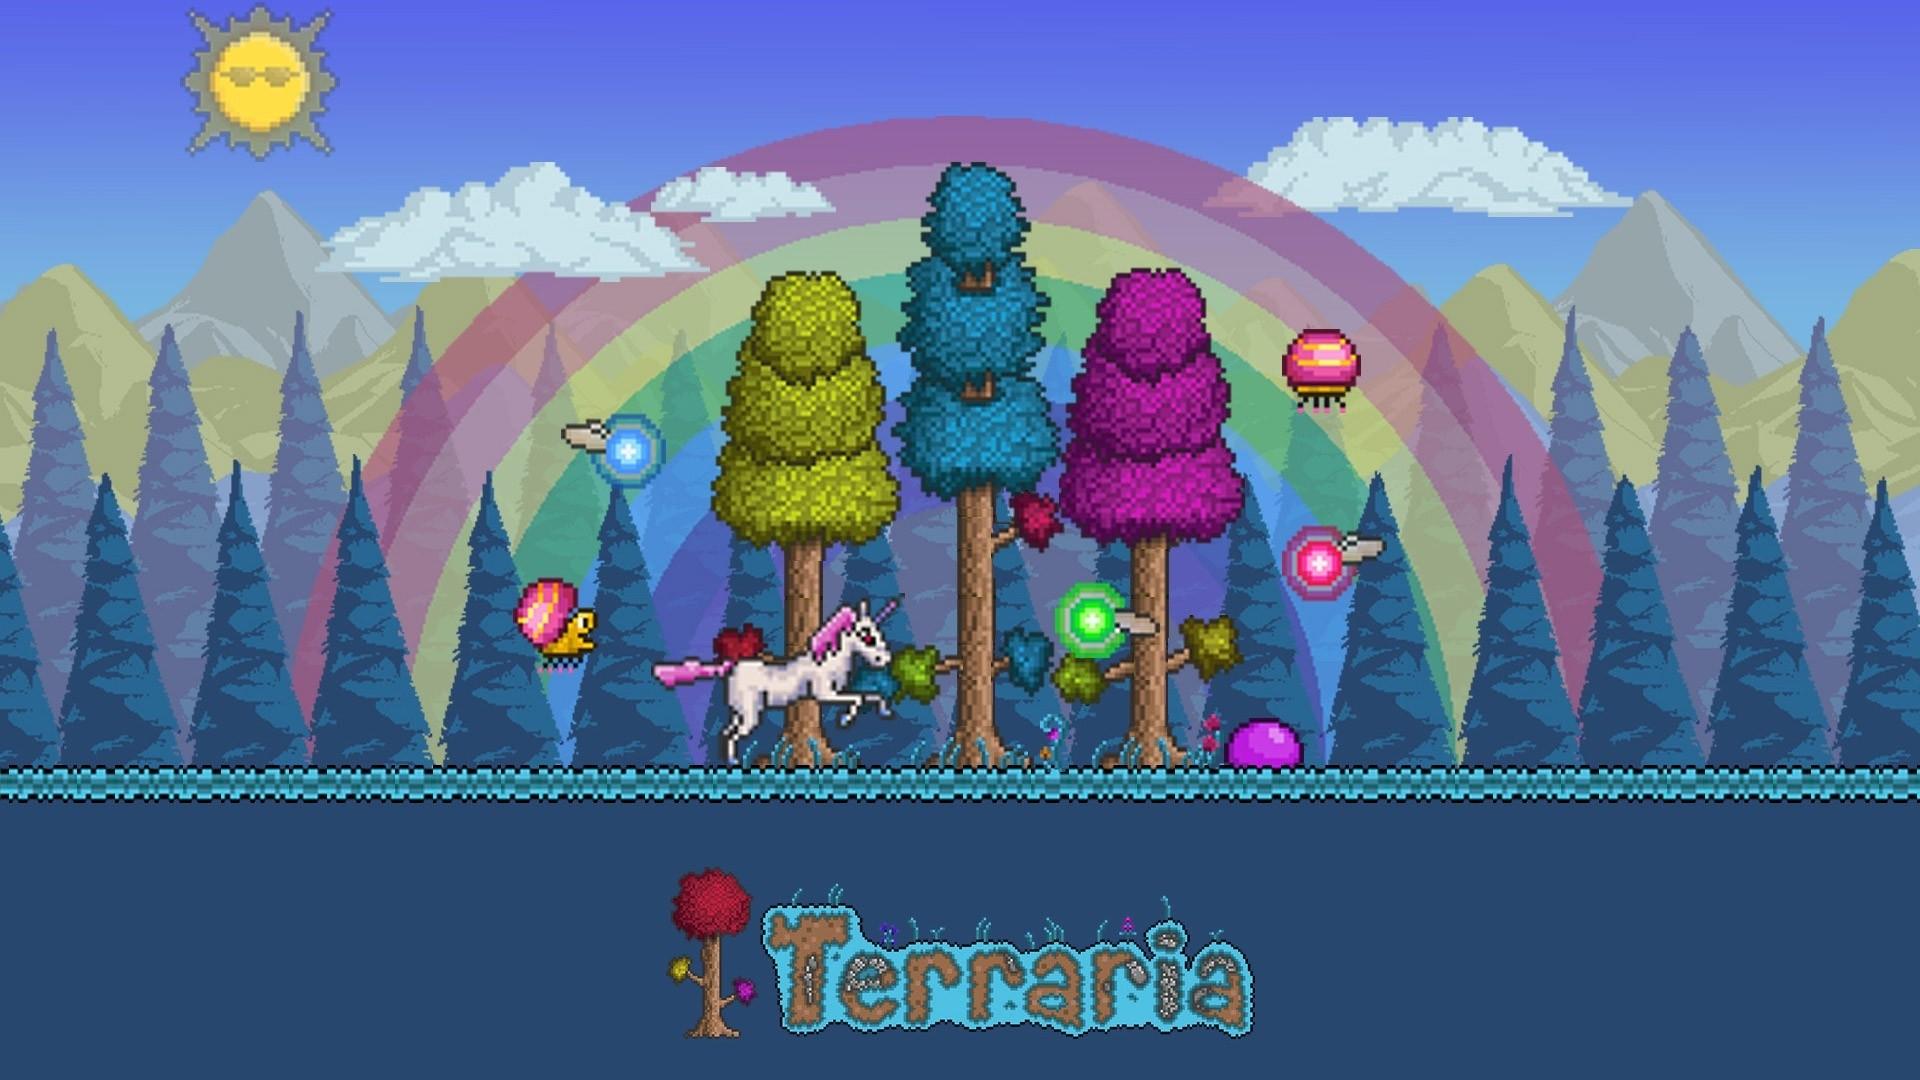 Terraria PC Wallpaper